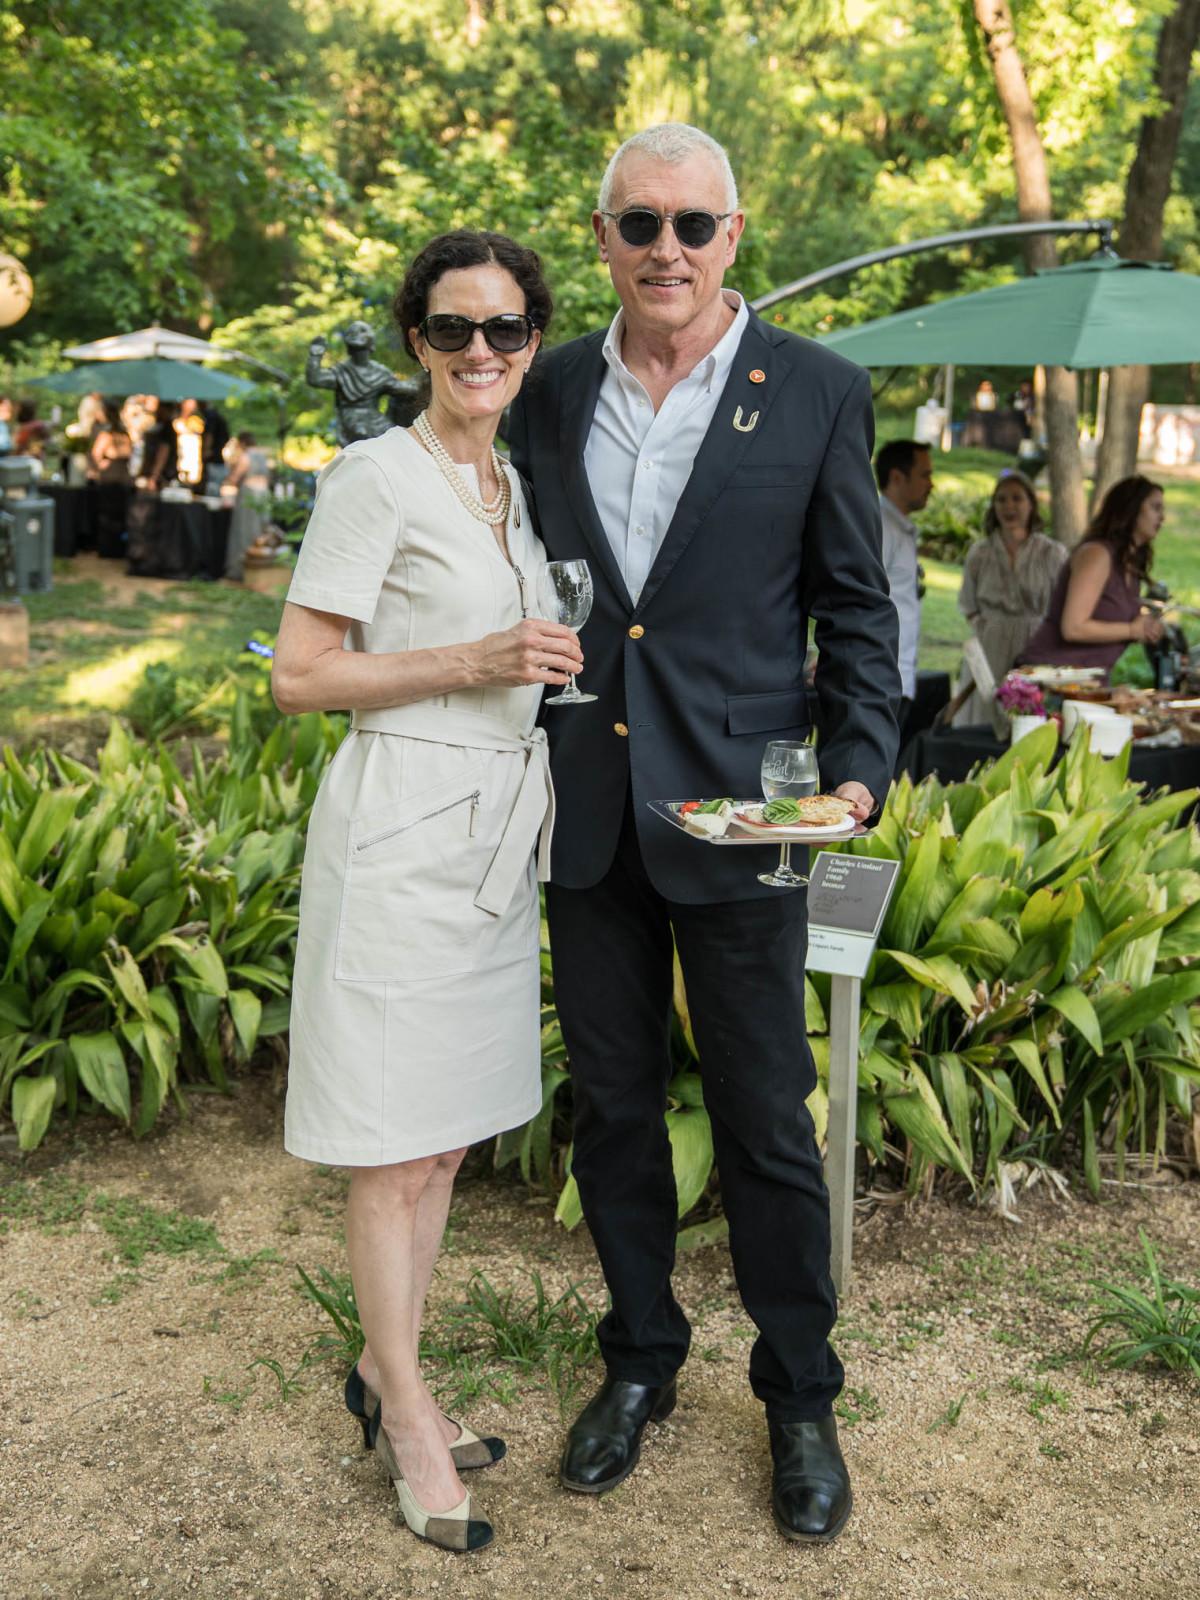 Umlauf Garden Party 2019 JoAnn Sciarrino Frederick Schmid